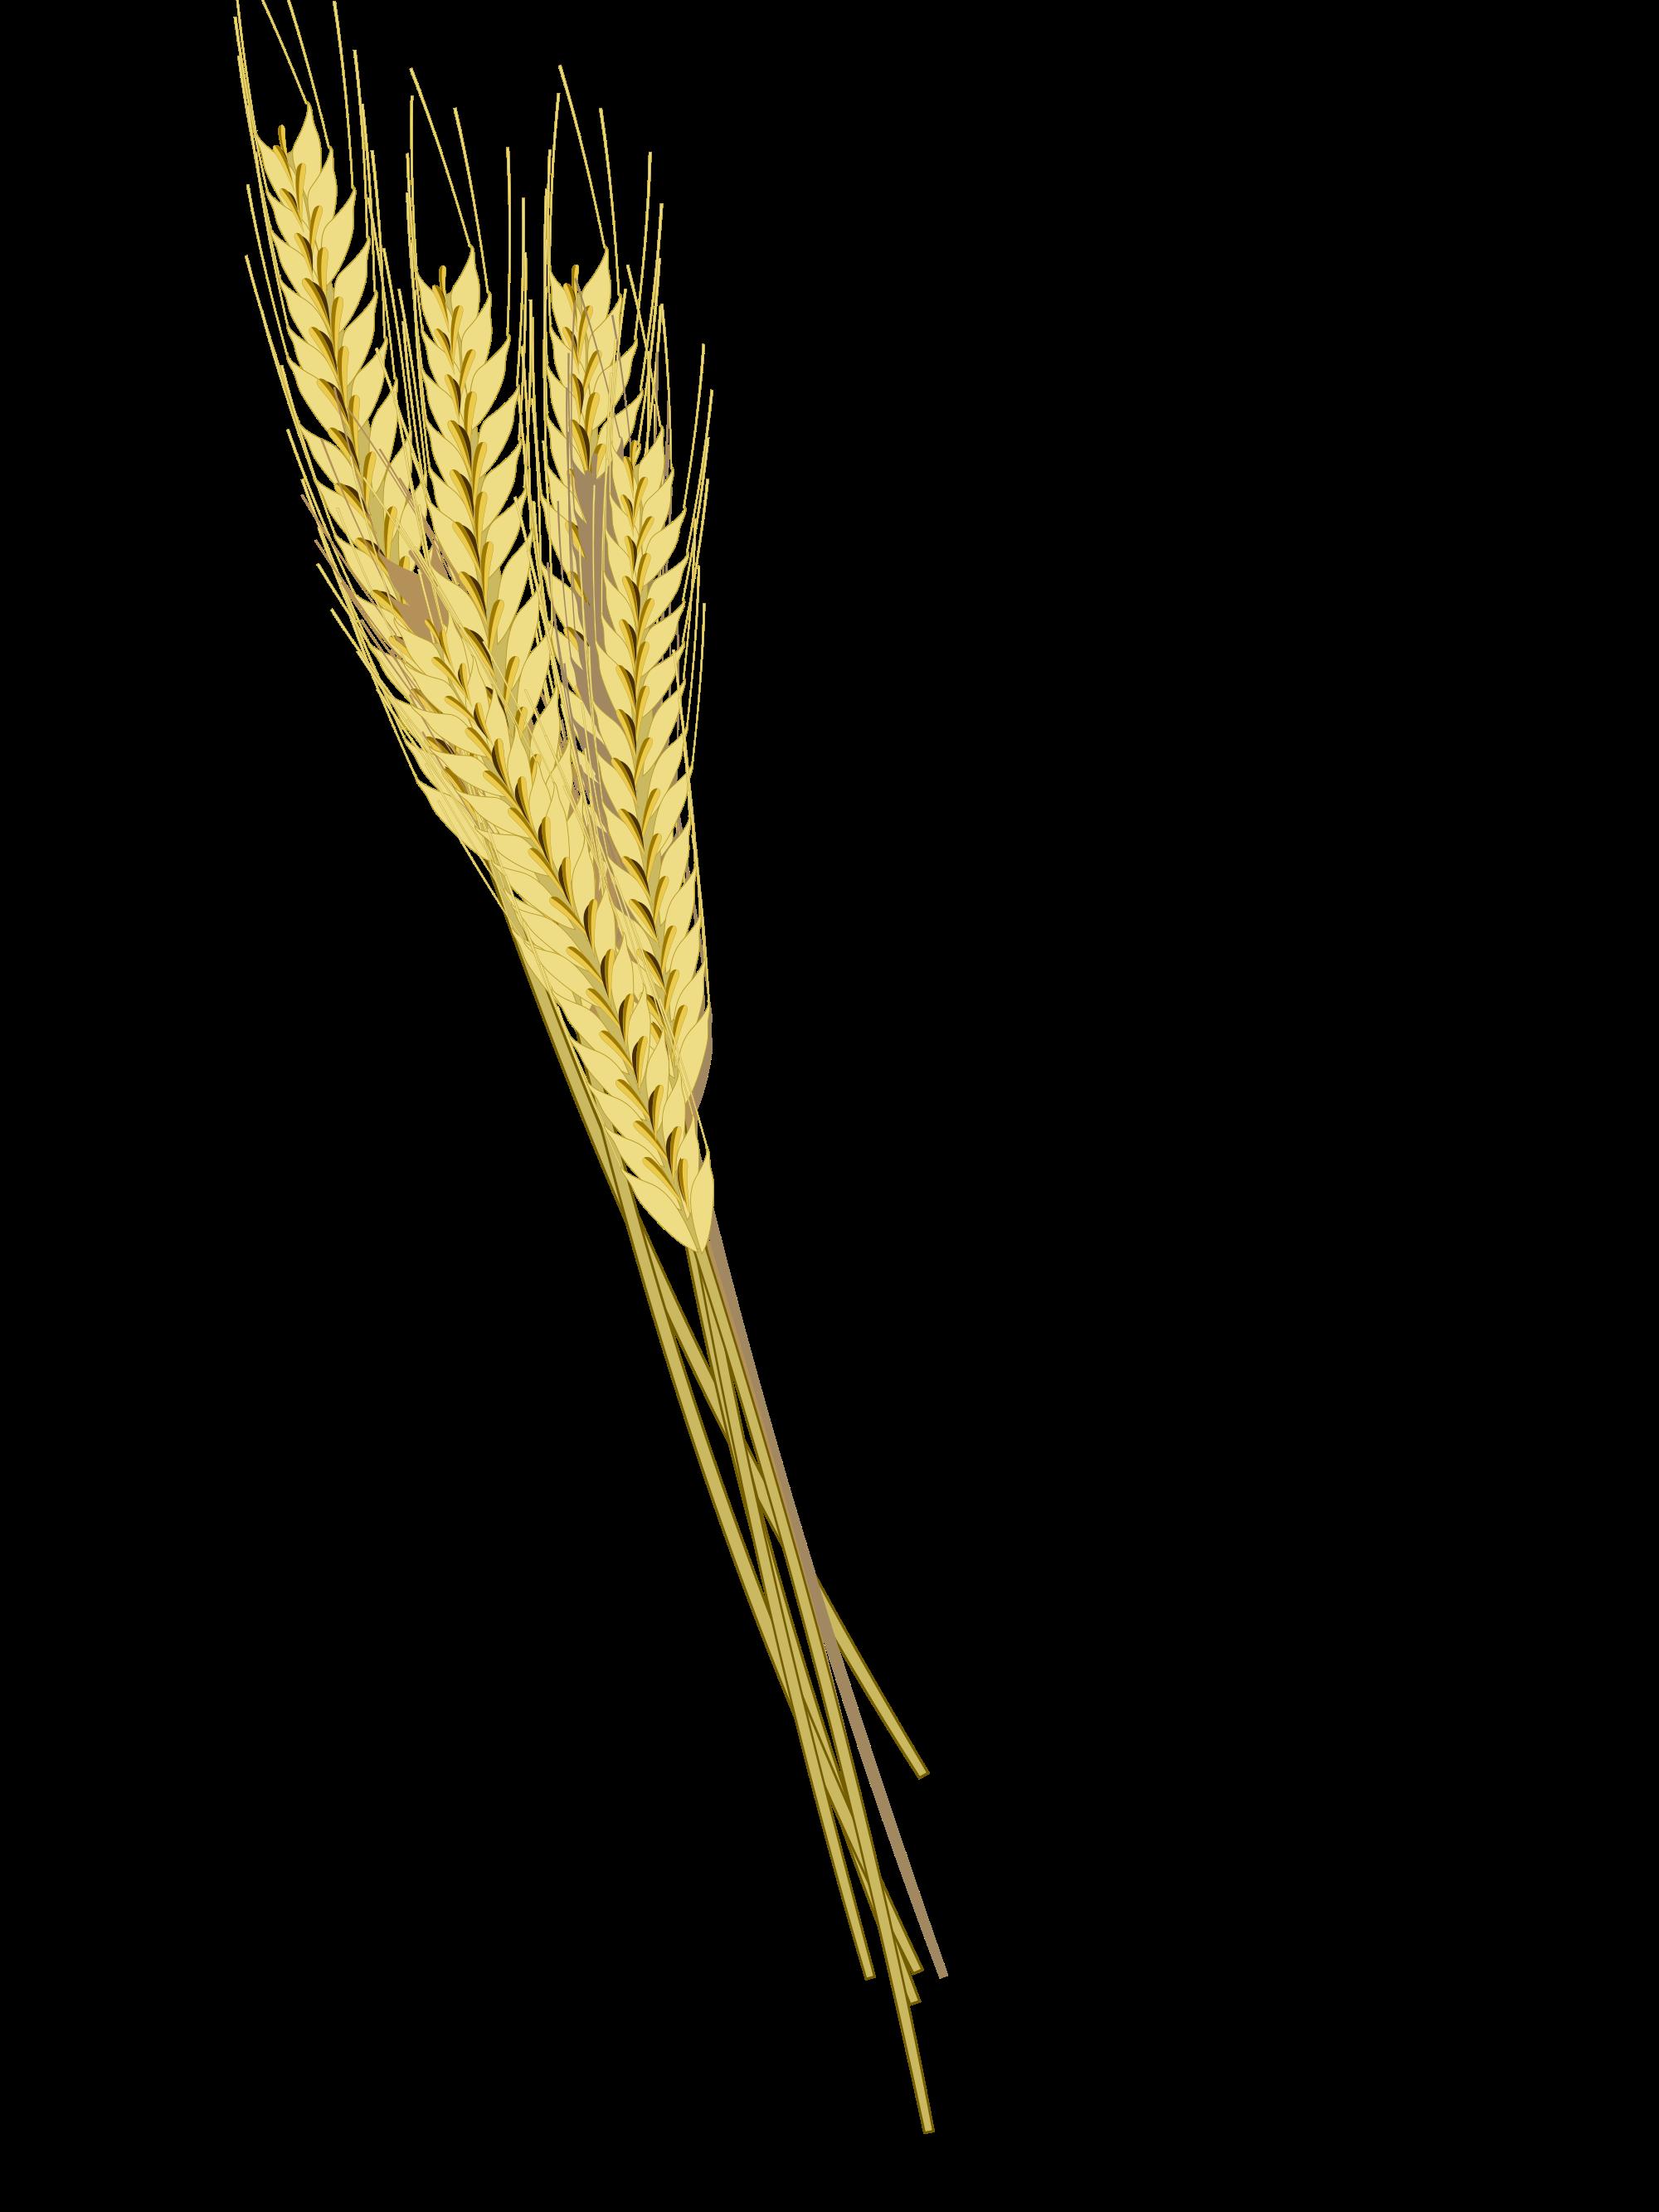 Grain clipart barley. Download png photos free